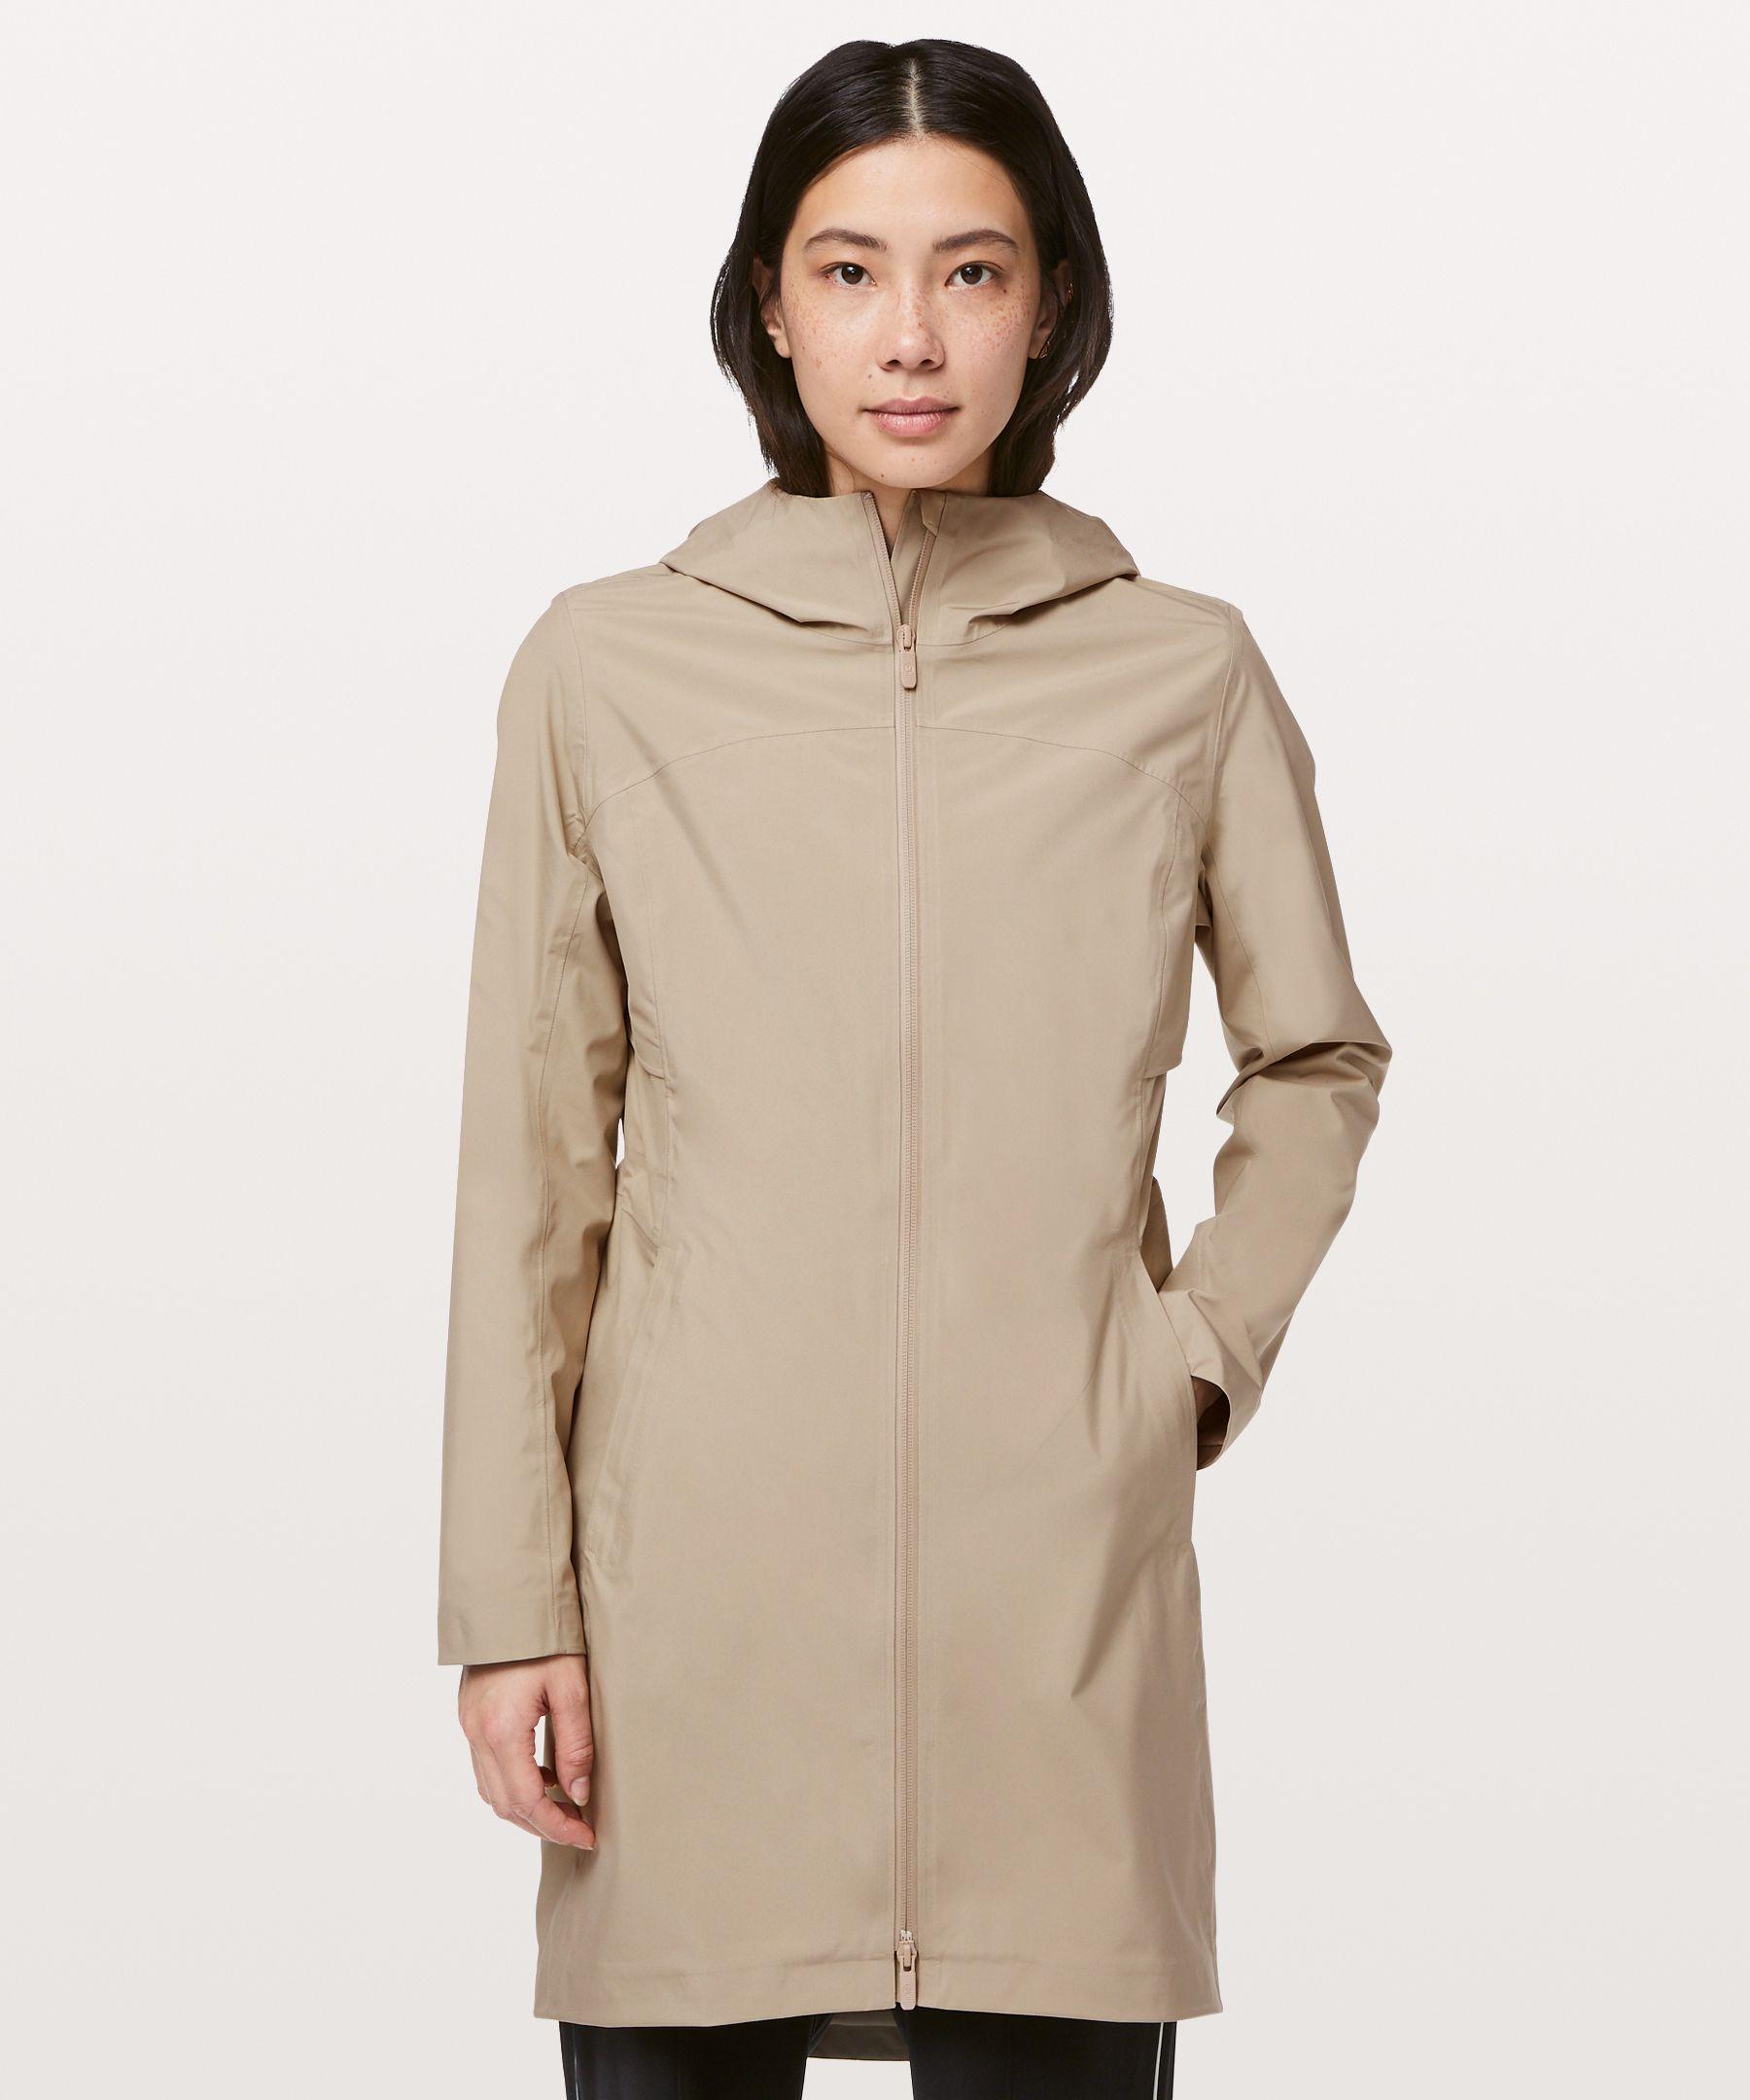 Lululemon Rain Rebel Jacket In Sandlot